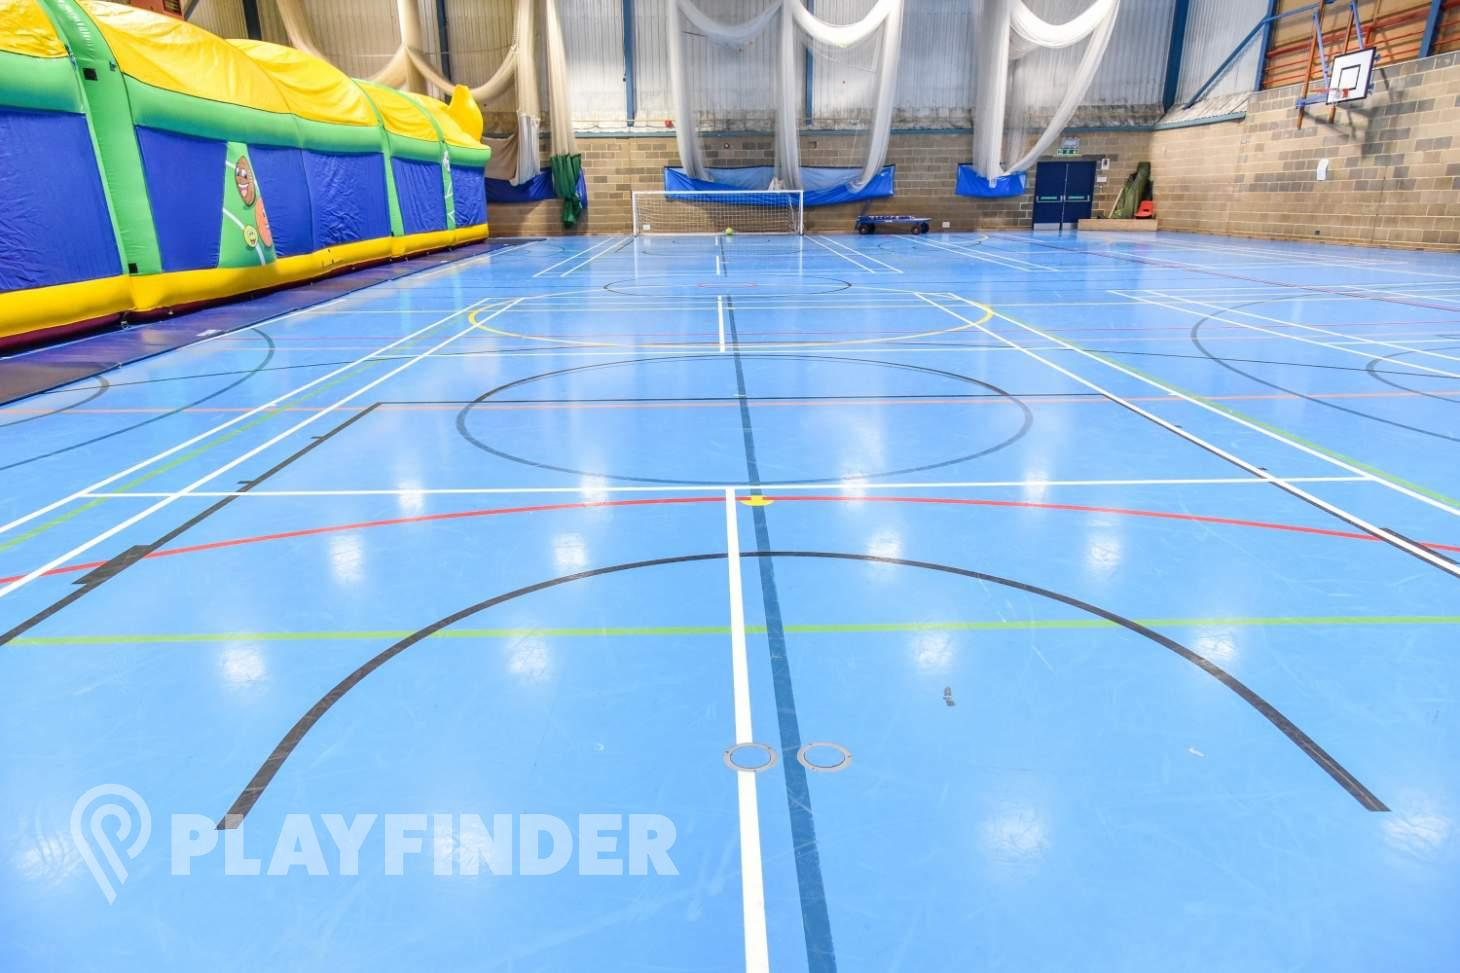 Aldenham School Sports Centre Nets | Indoor cricket facilities